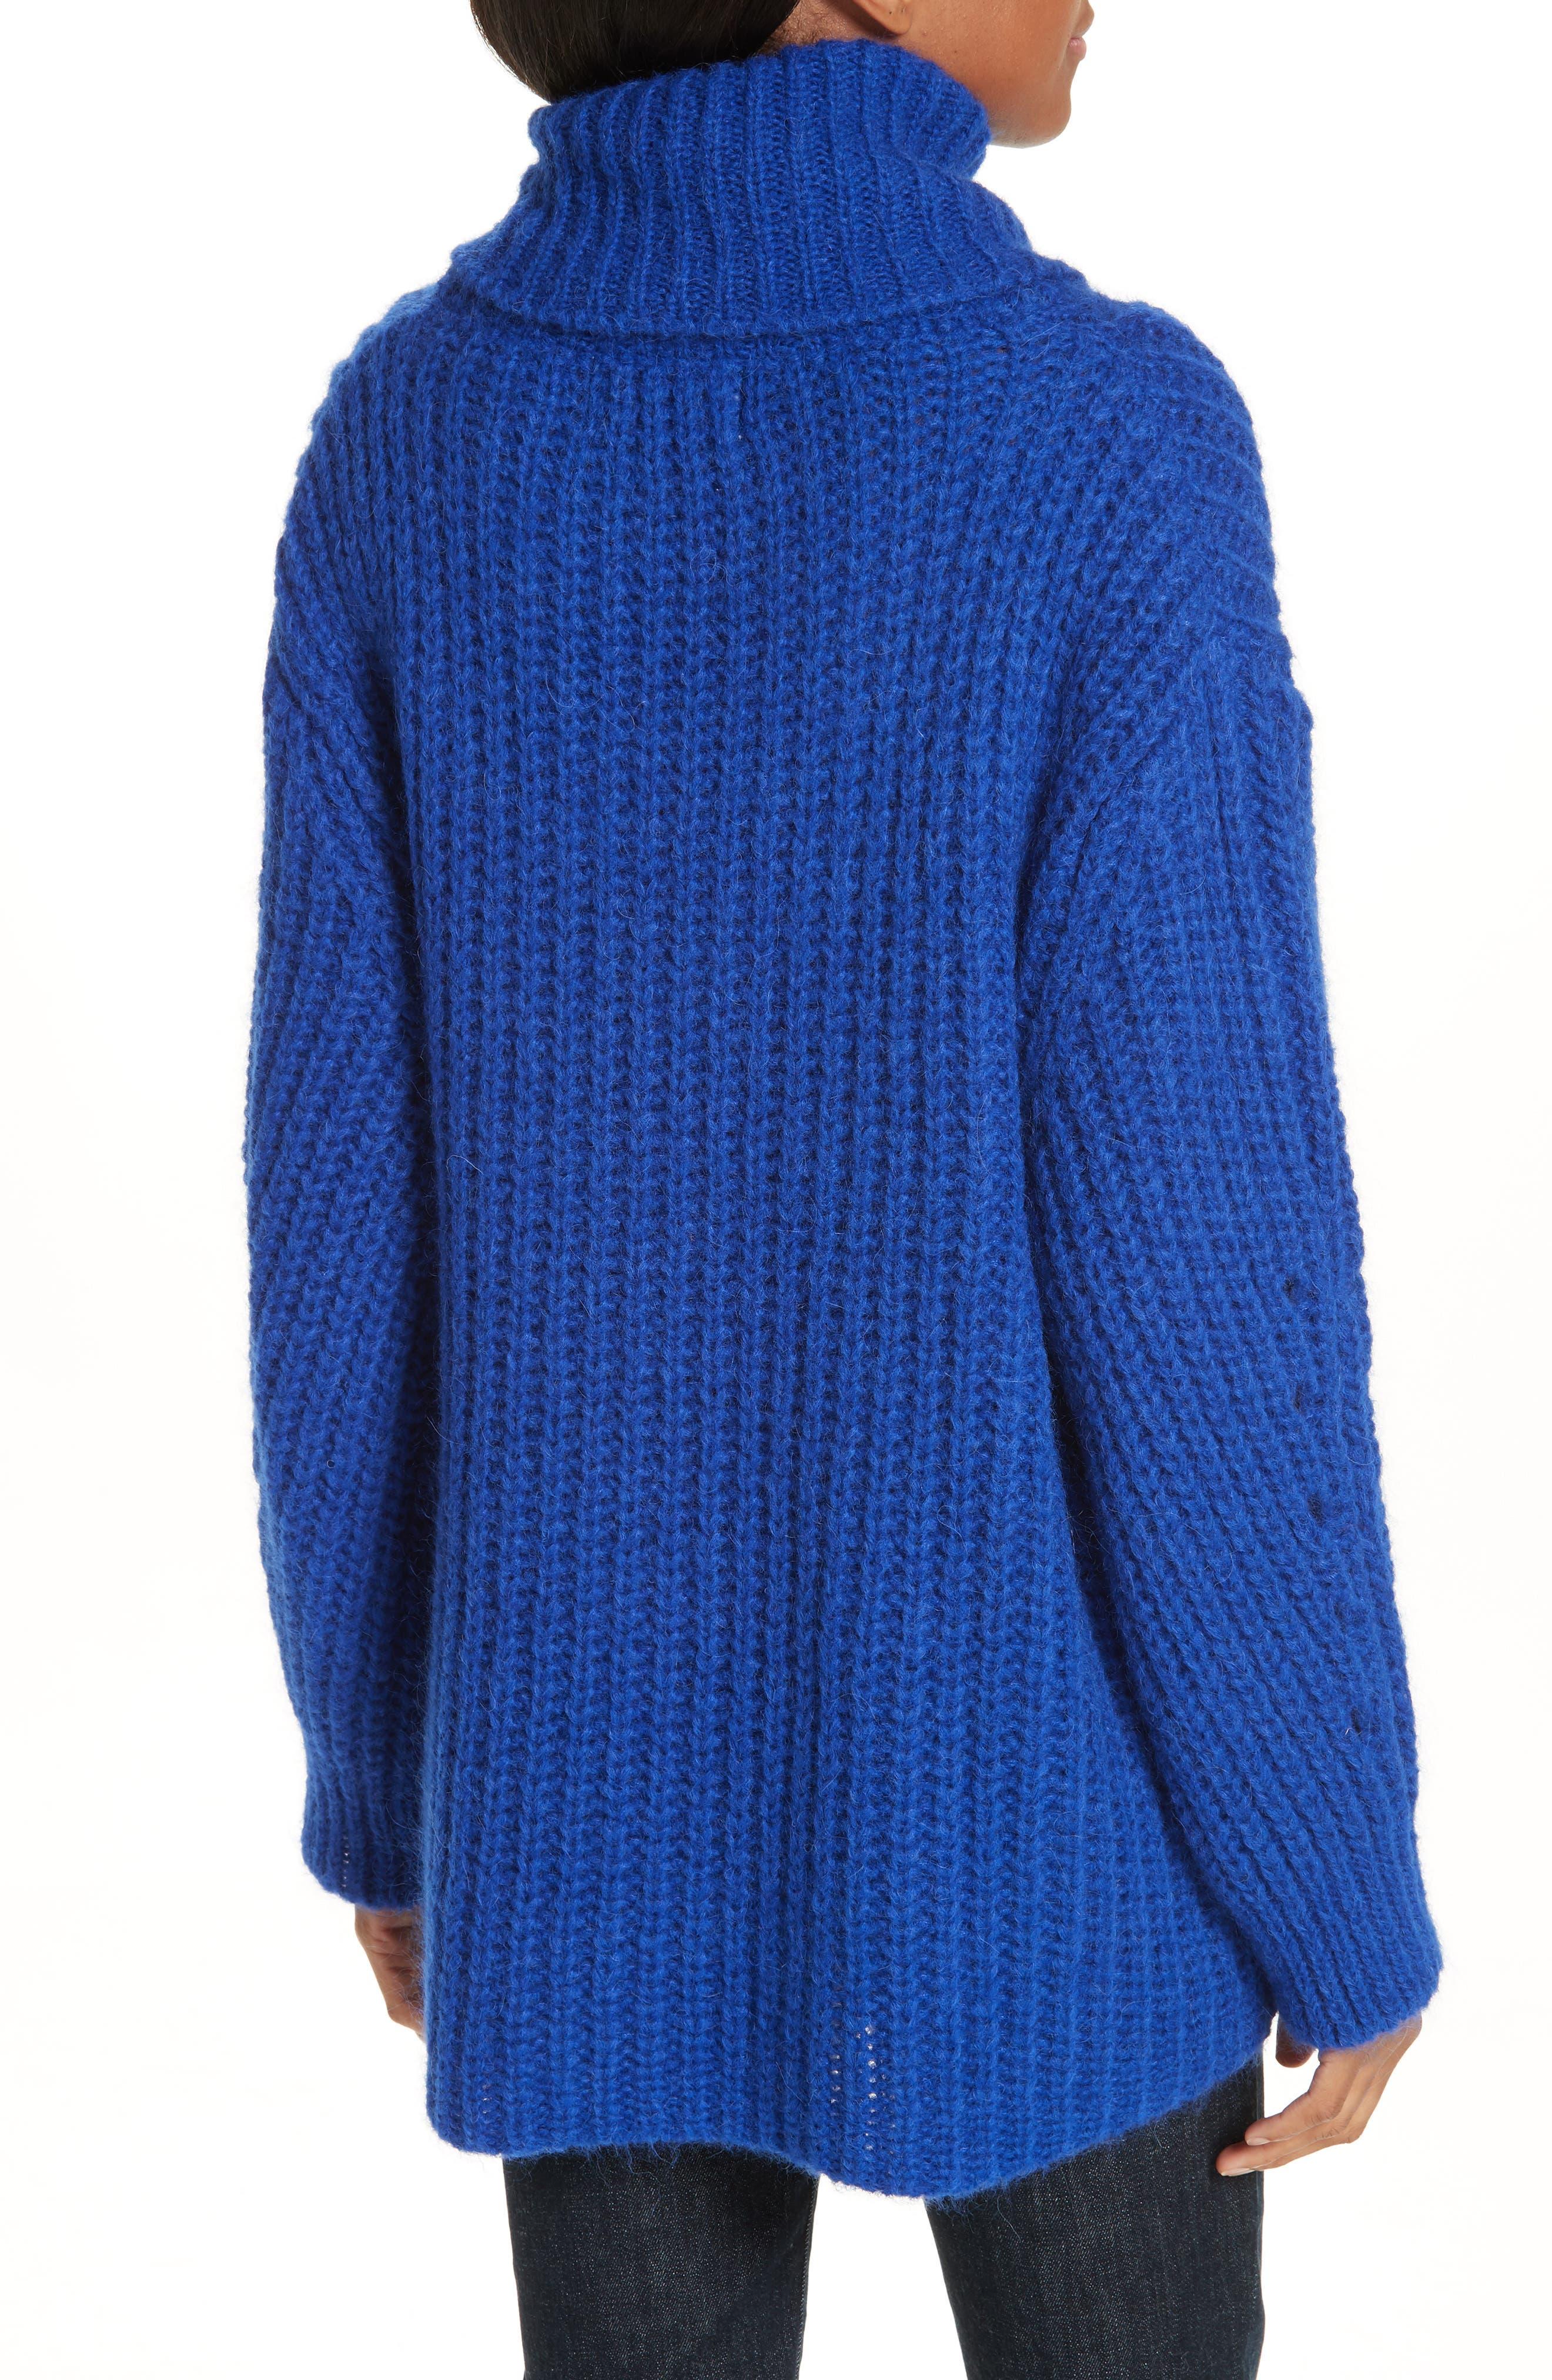 Emera Turtleneck Sweater,                             Alternate thumbnail 2, color,                             BLUE